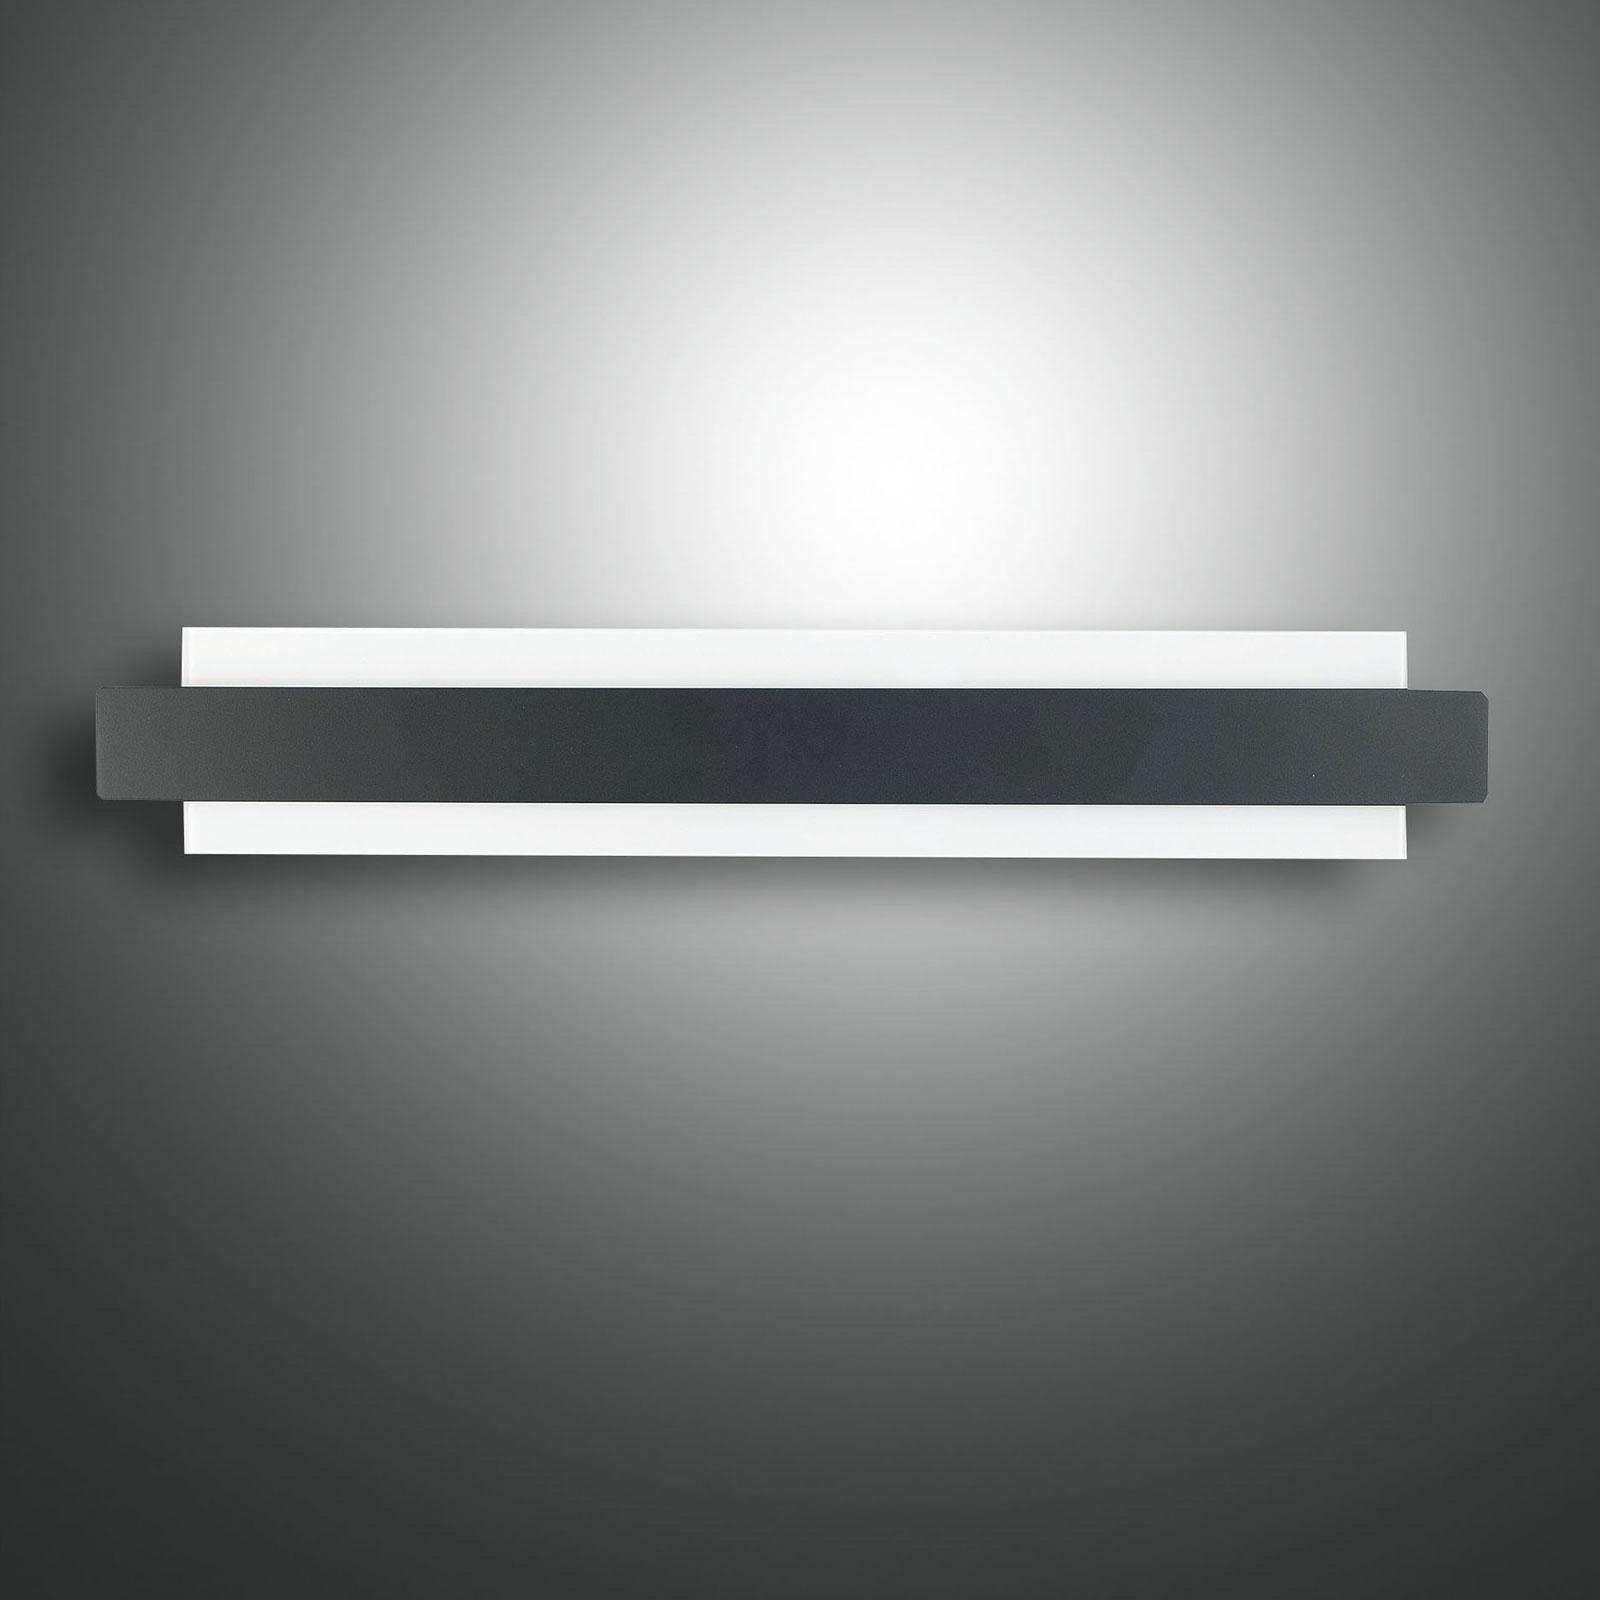 LED-vegglampe Regolo med metallfront, svart